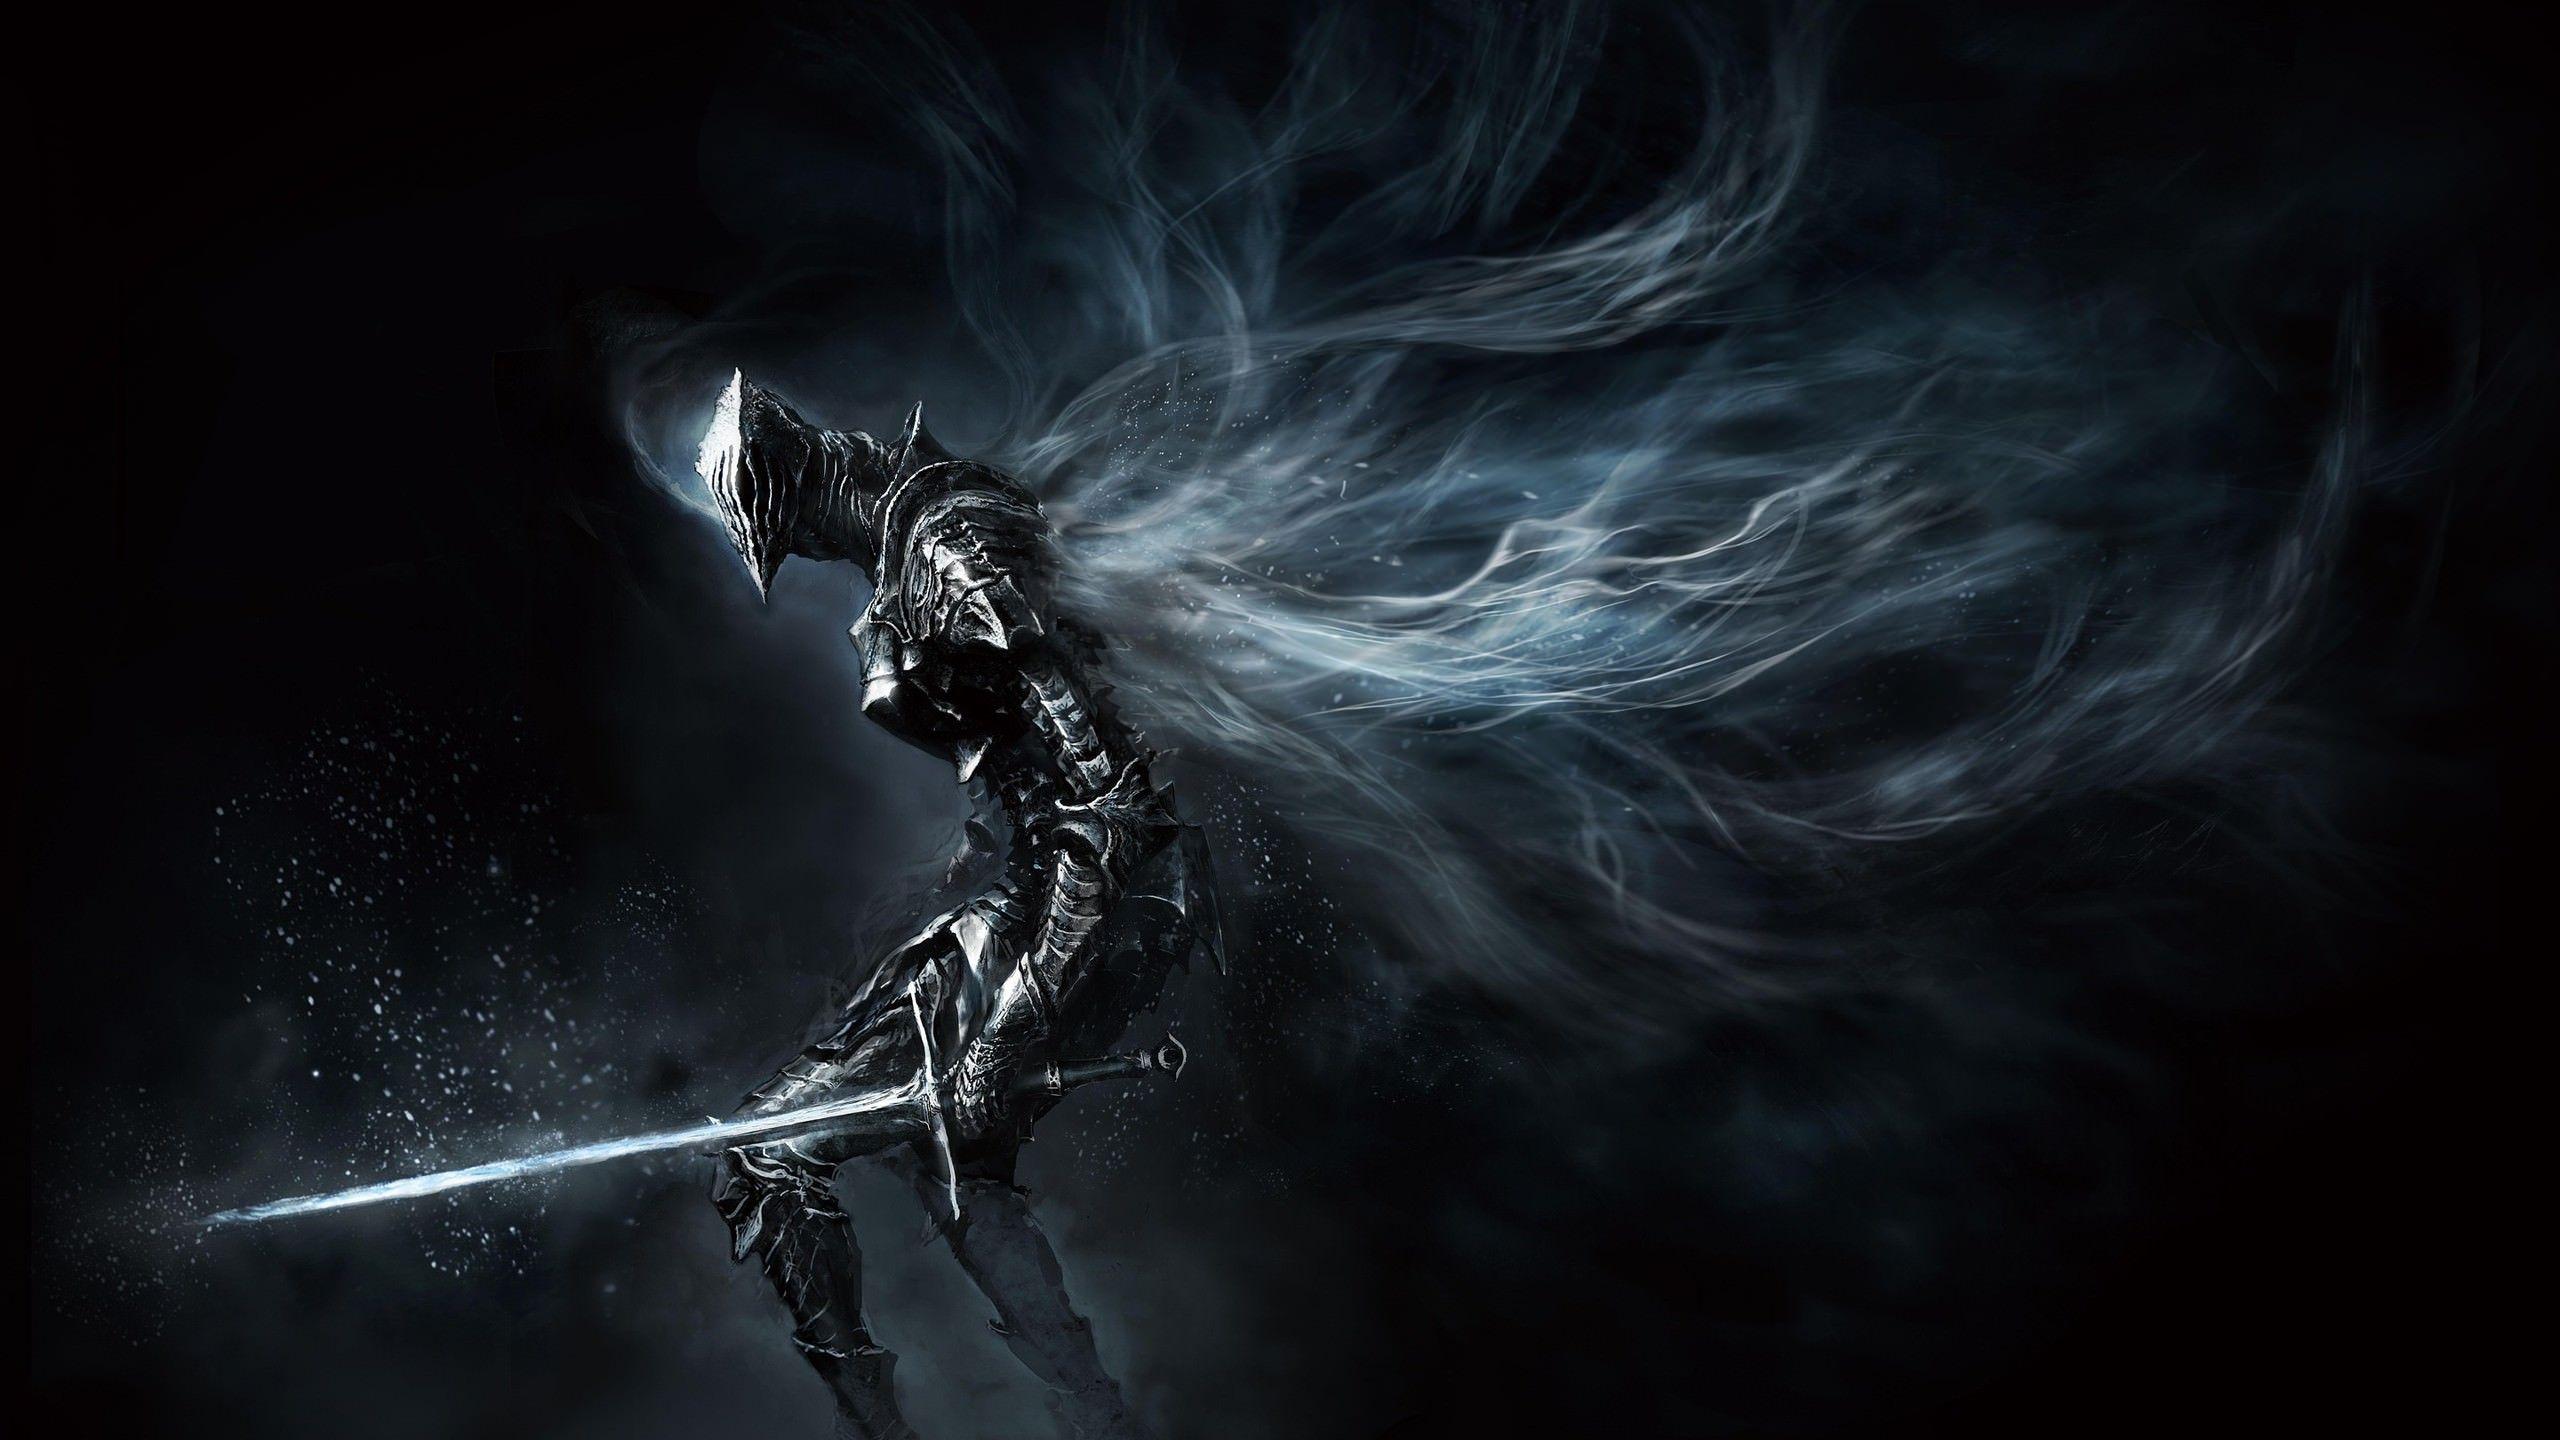 Illusion Of Dark Soul 2560x1440 En 2019 Dark Souls Fond